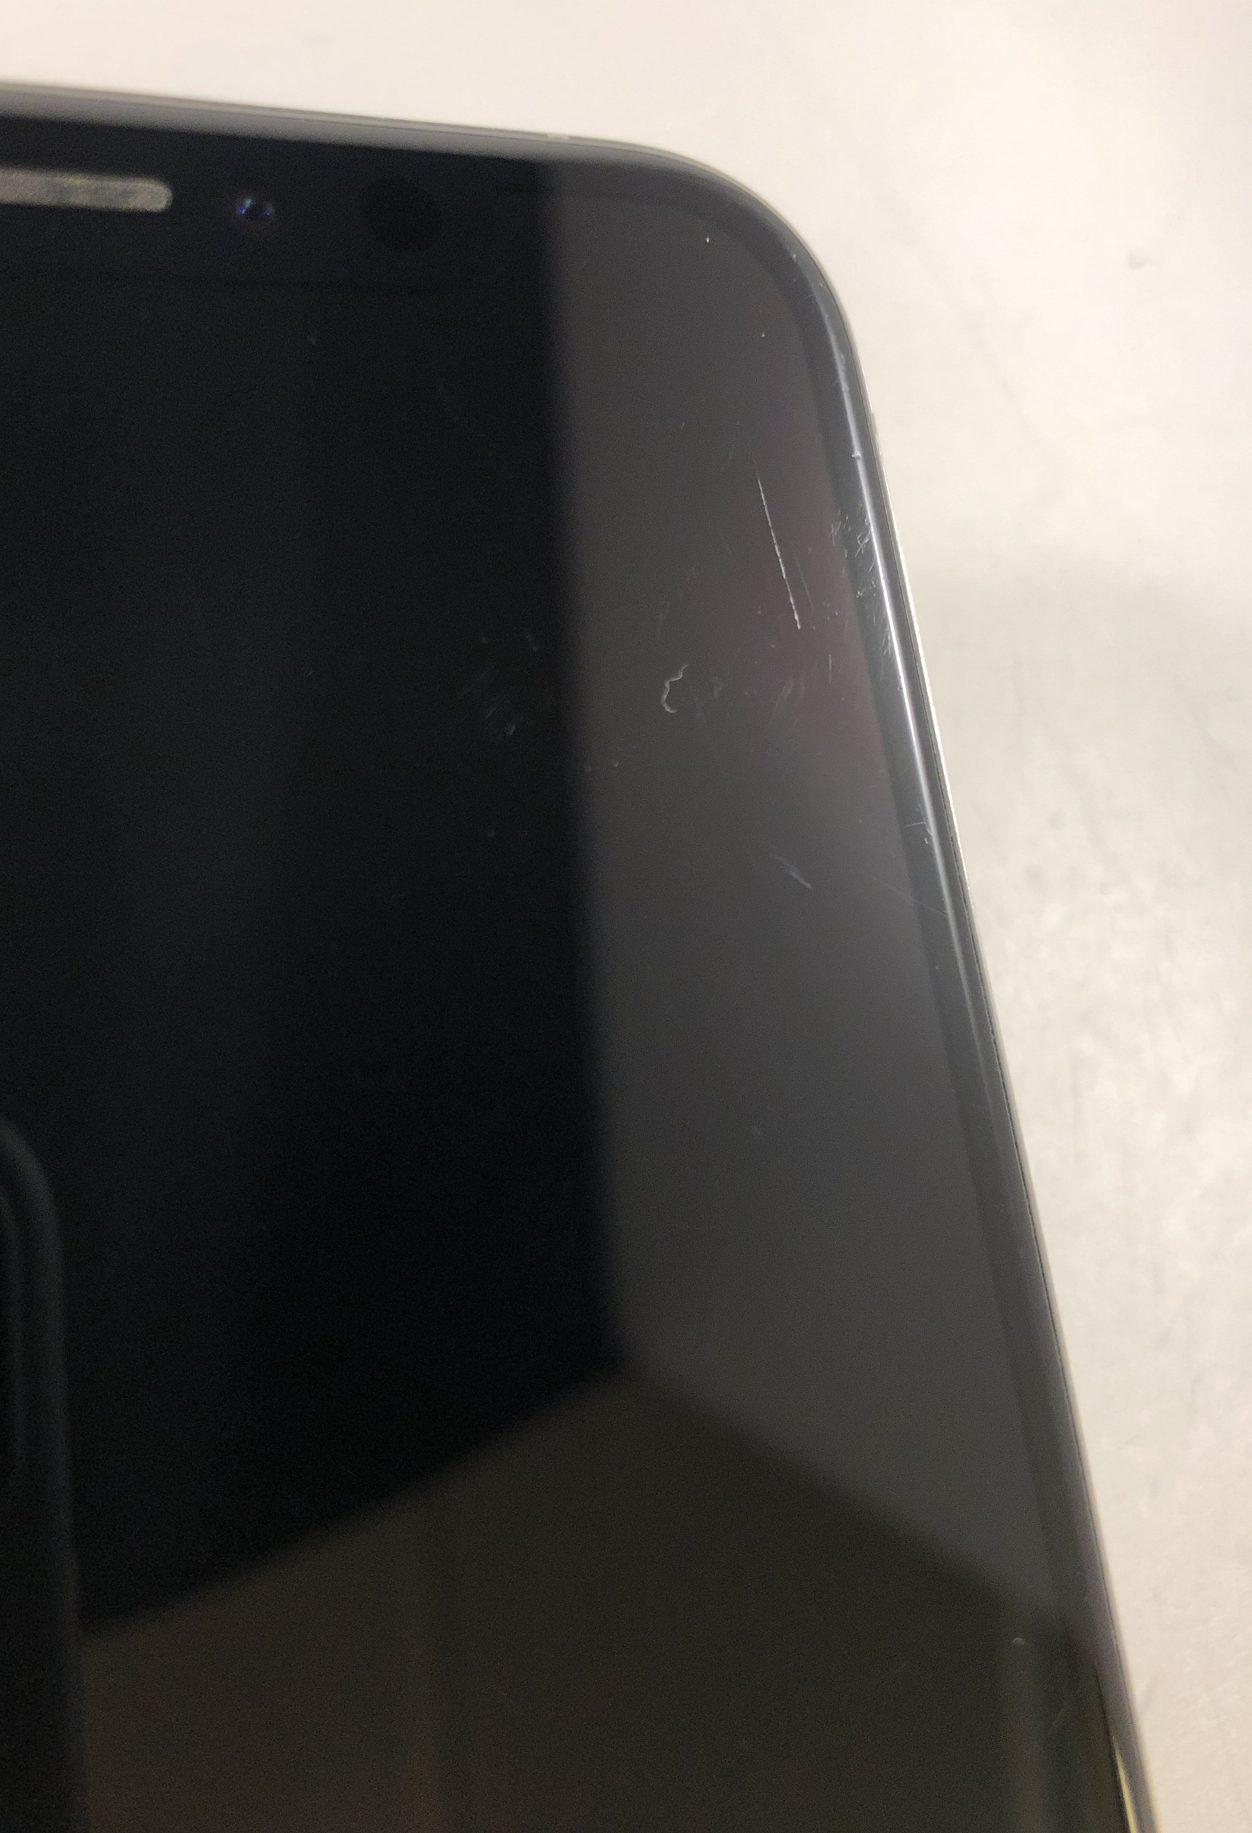 iPhone 11 Pro 256GB, 256GB, Silver, bild 4